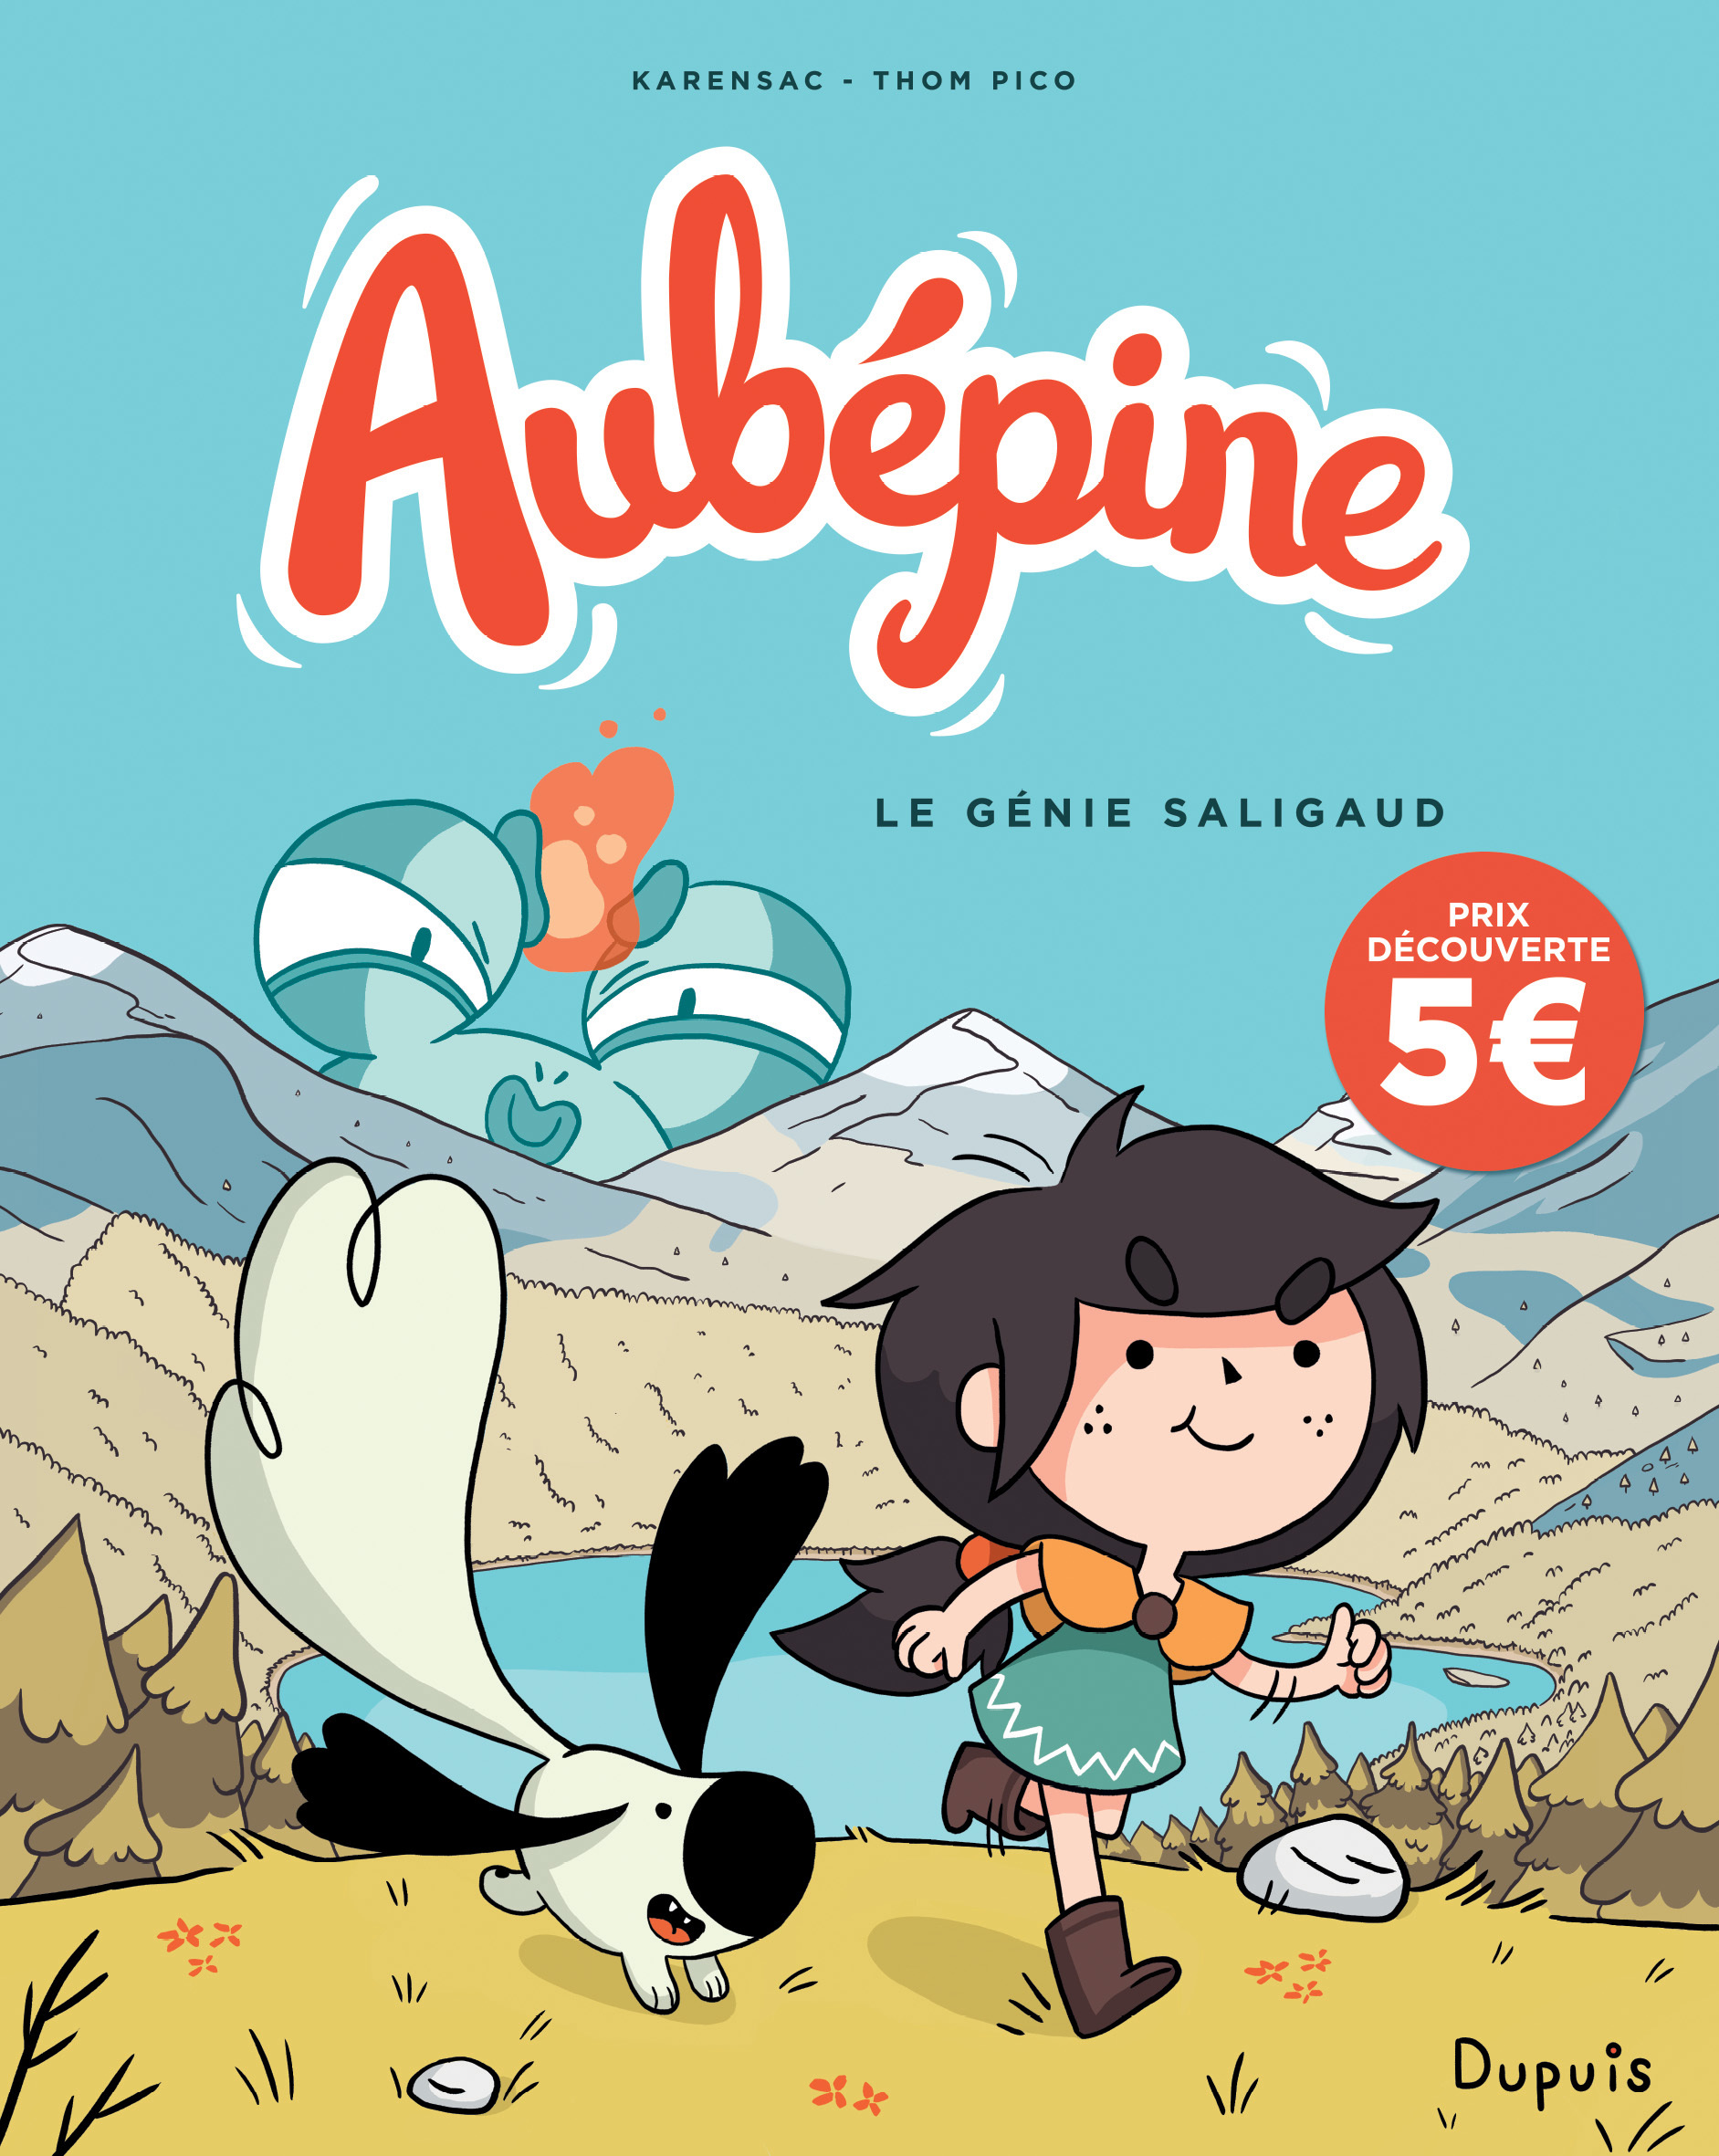 AUBEPINE - TOME 1 - LE GENIE SALIGAUD (PRIX REDUIT)